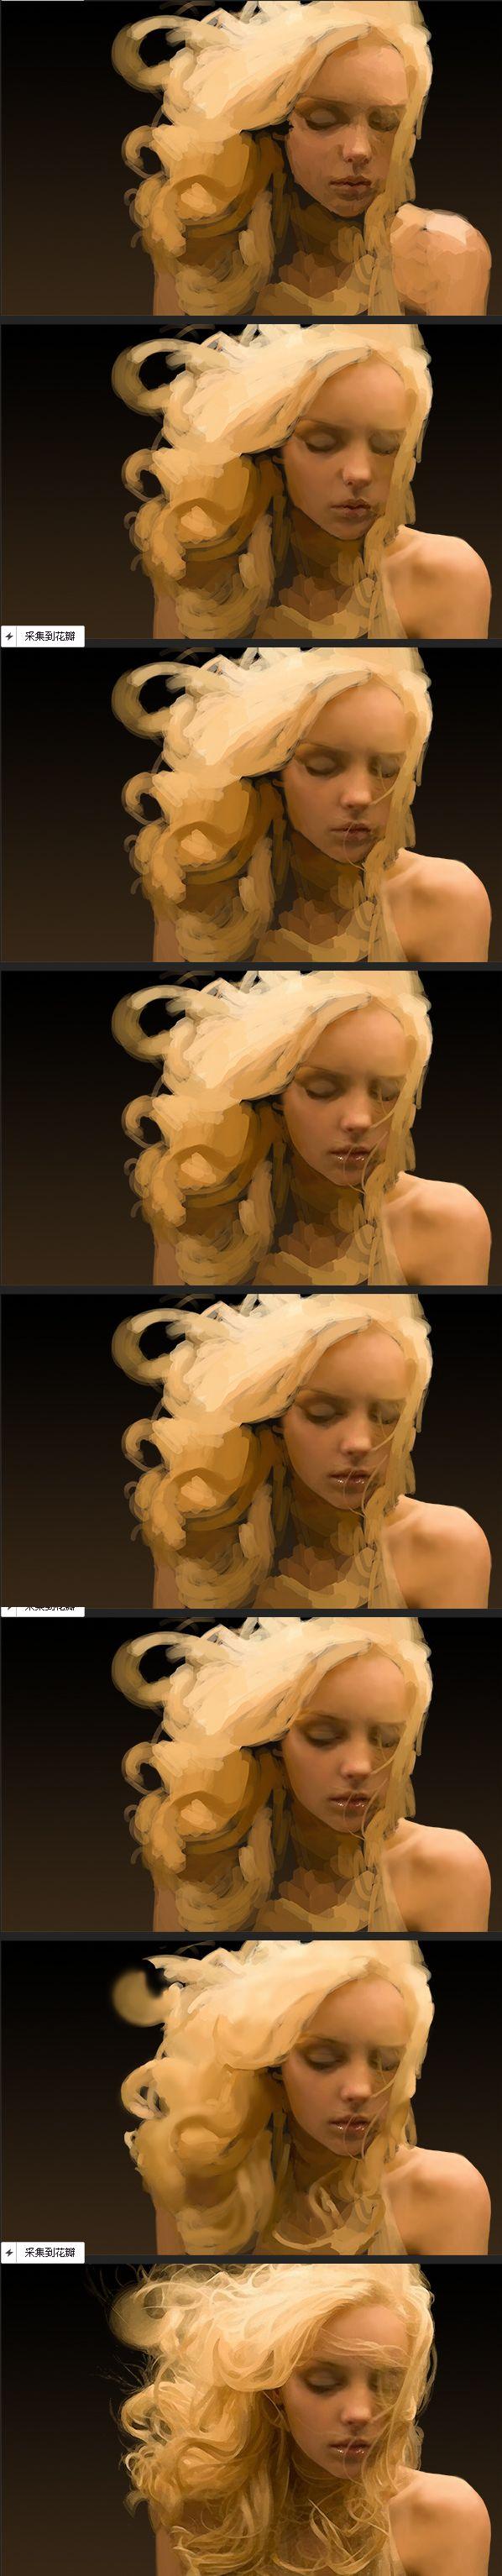 Painting progress of blonde